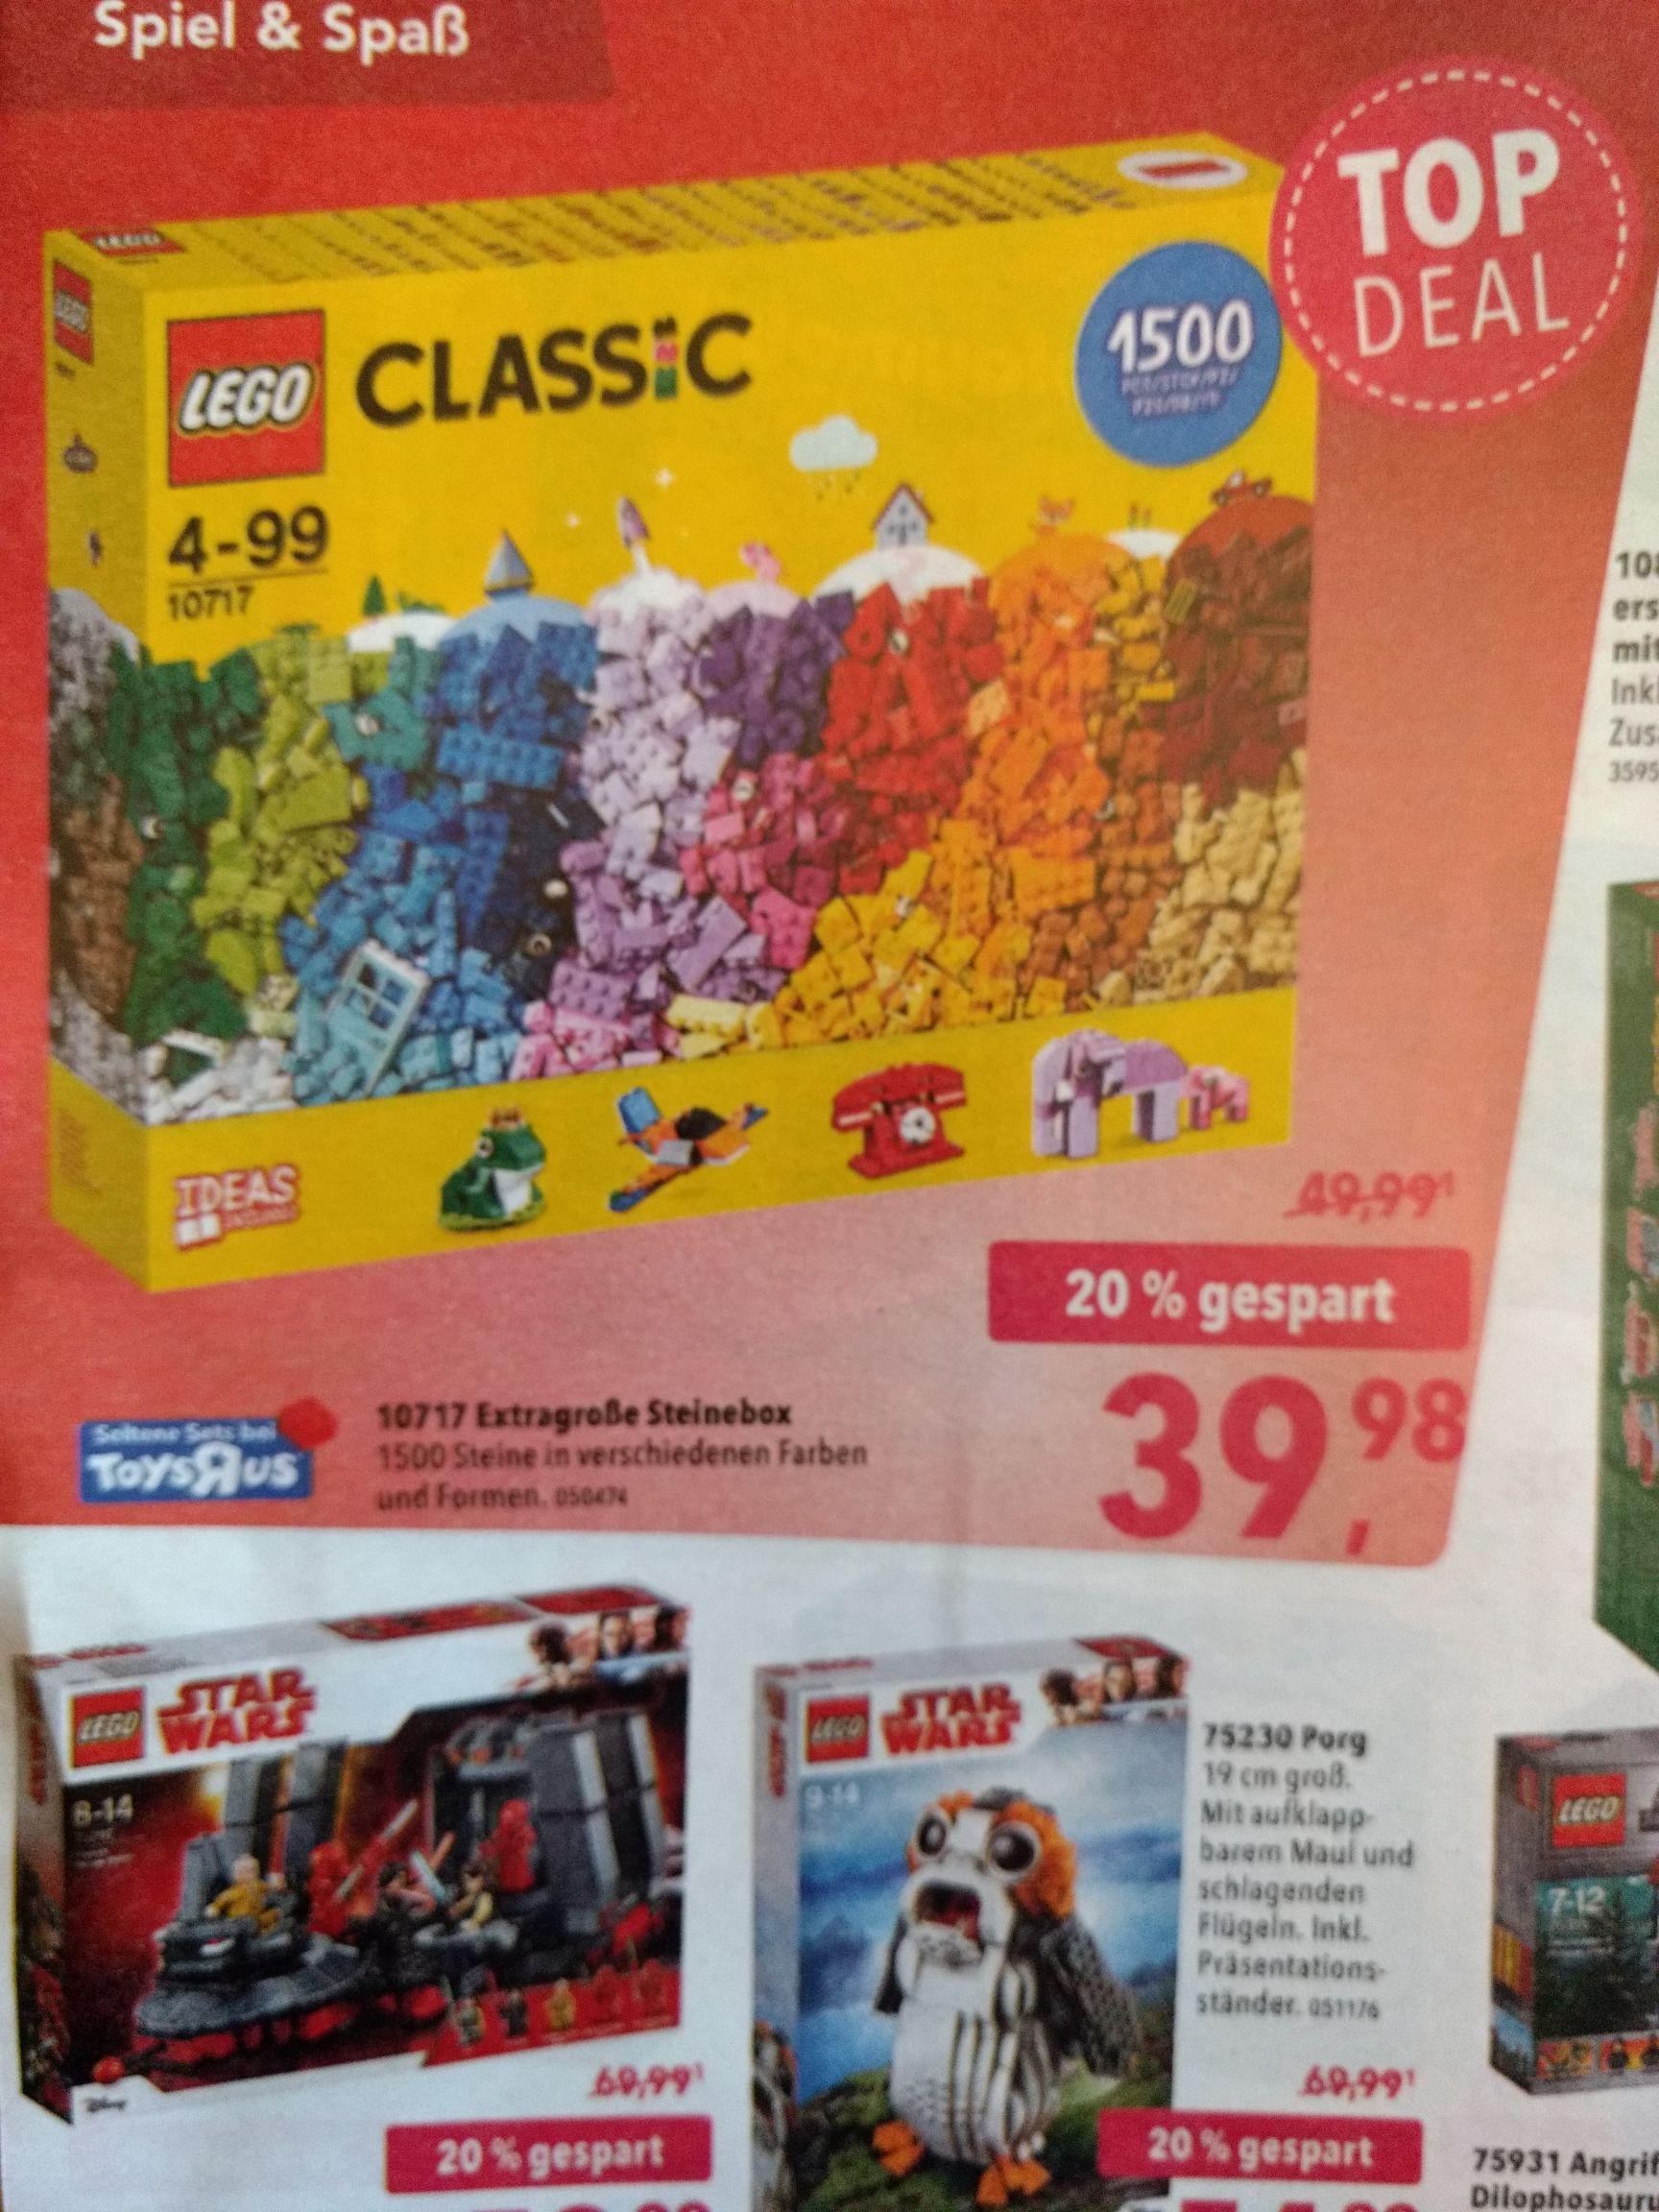 [Offline] ToysRUs: Lego Classic Steinebox 10717